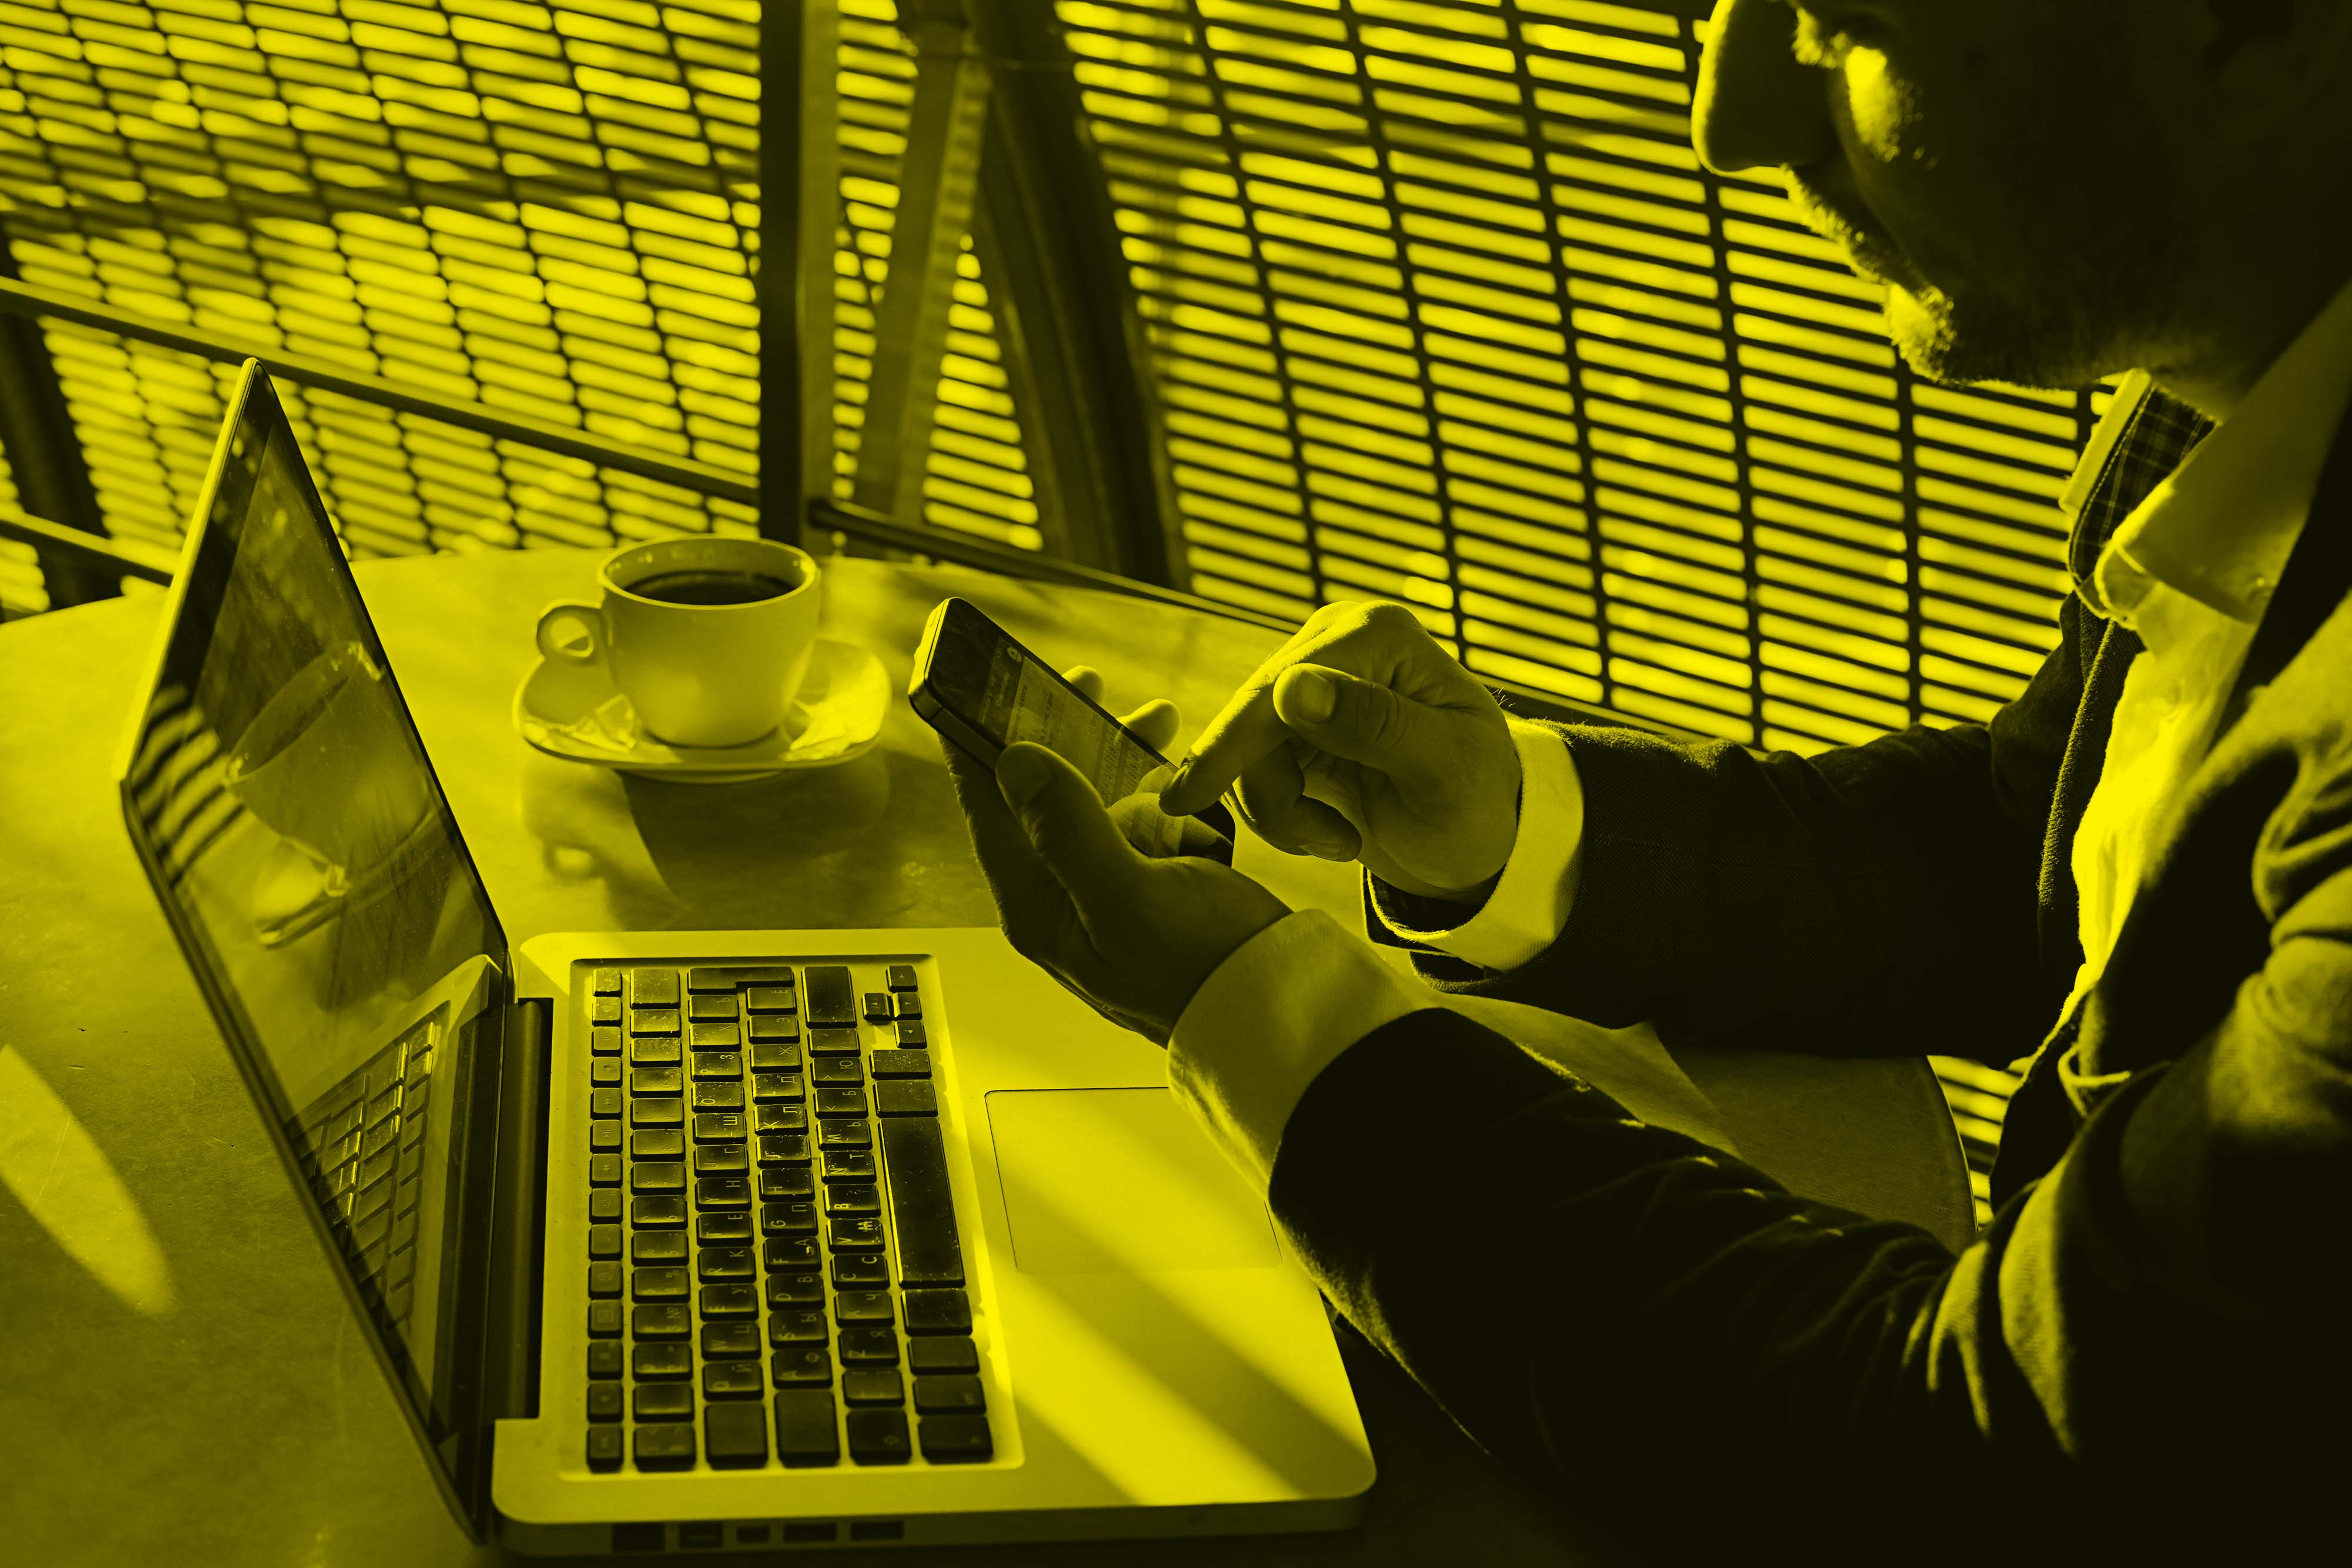 Man_Coffee_Laptop_Cell_yellow.jpg